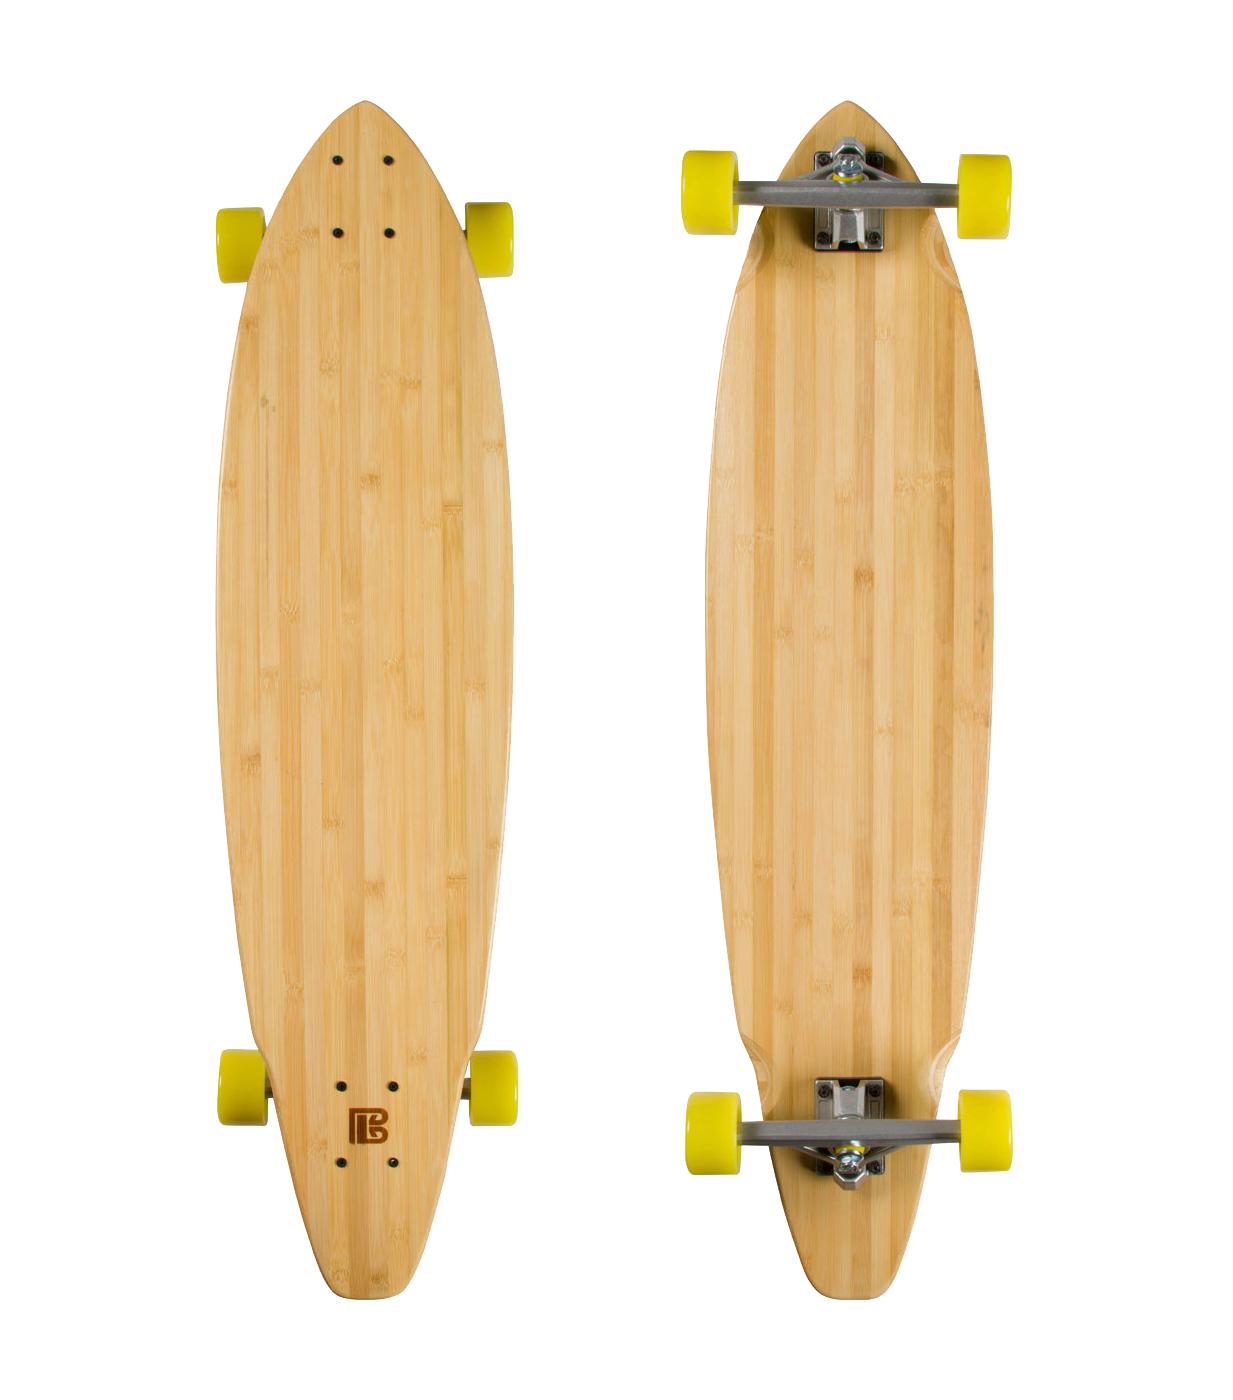 Eclipse Bamboo Galaxy Series Skateboard Deck